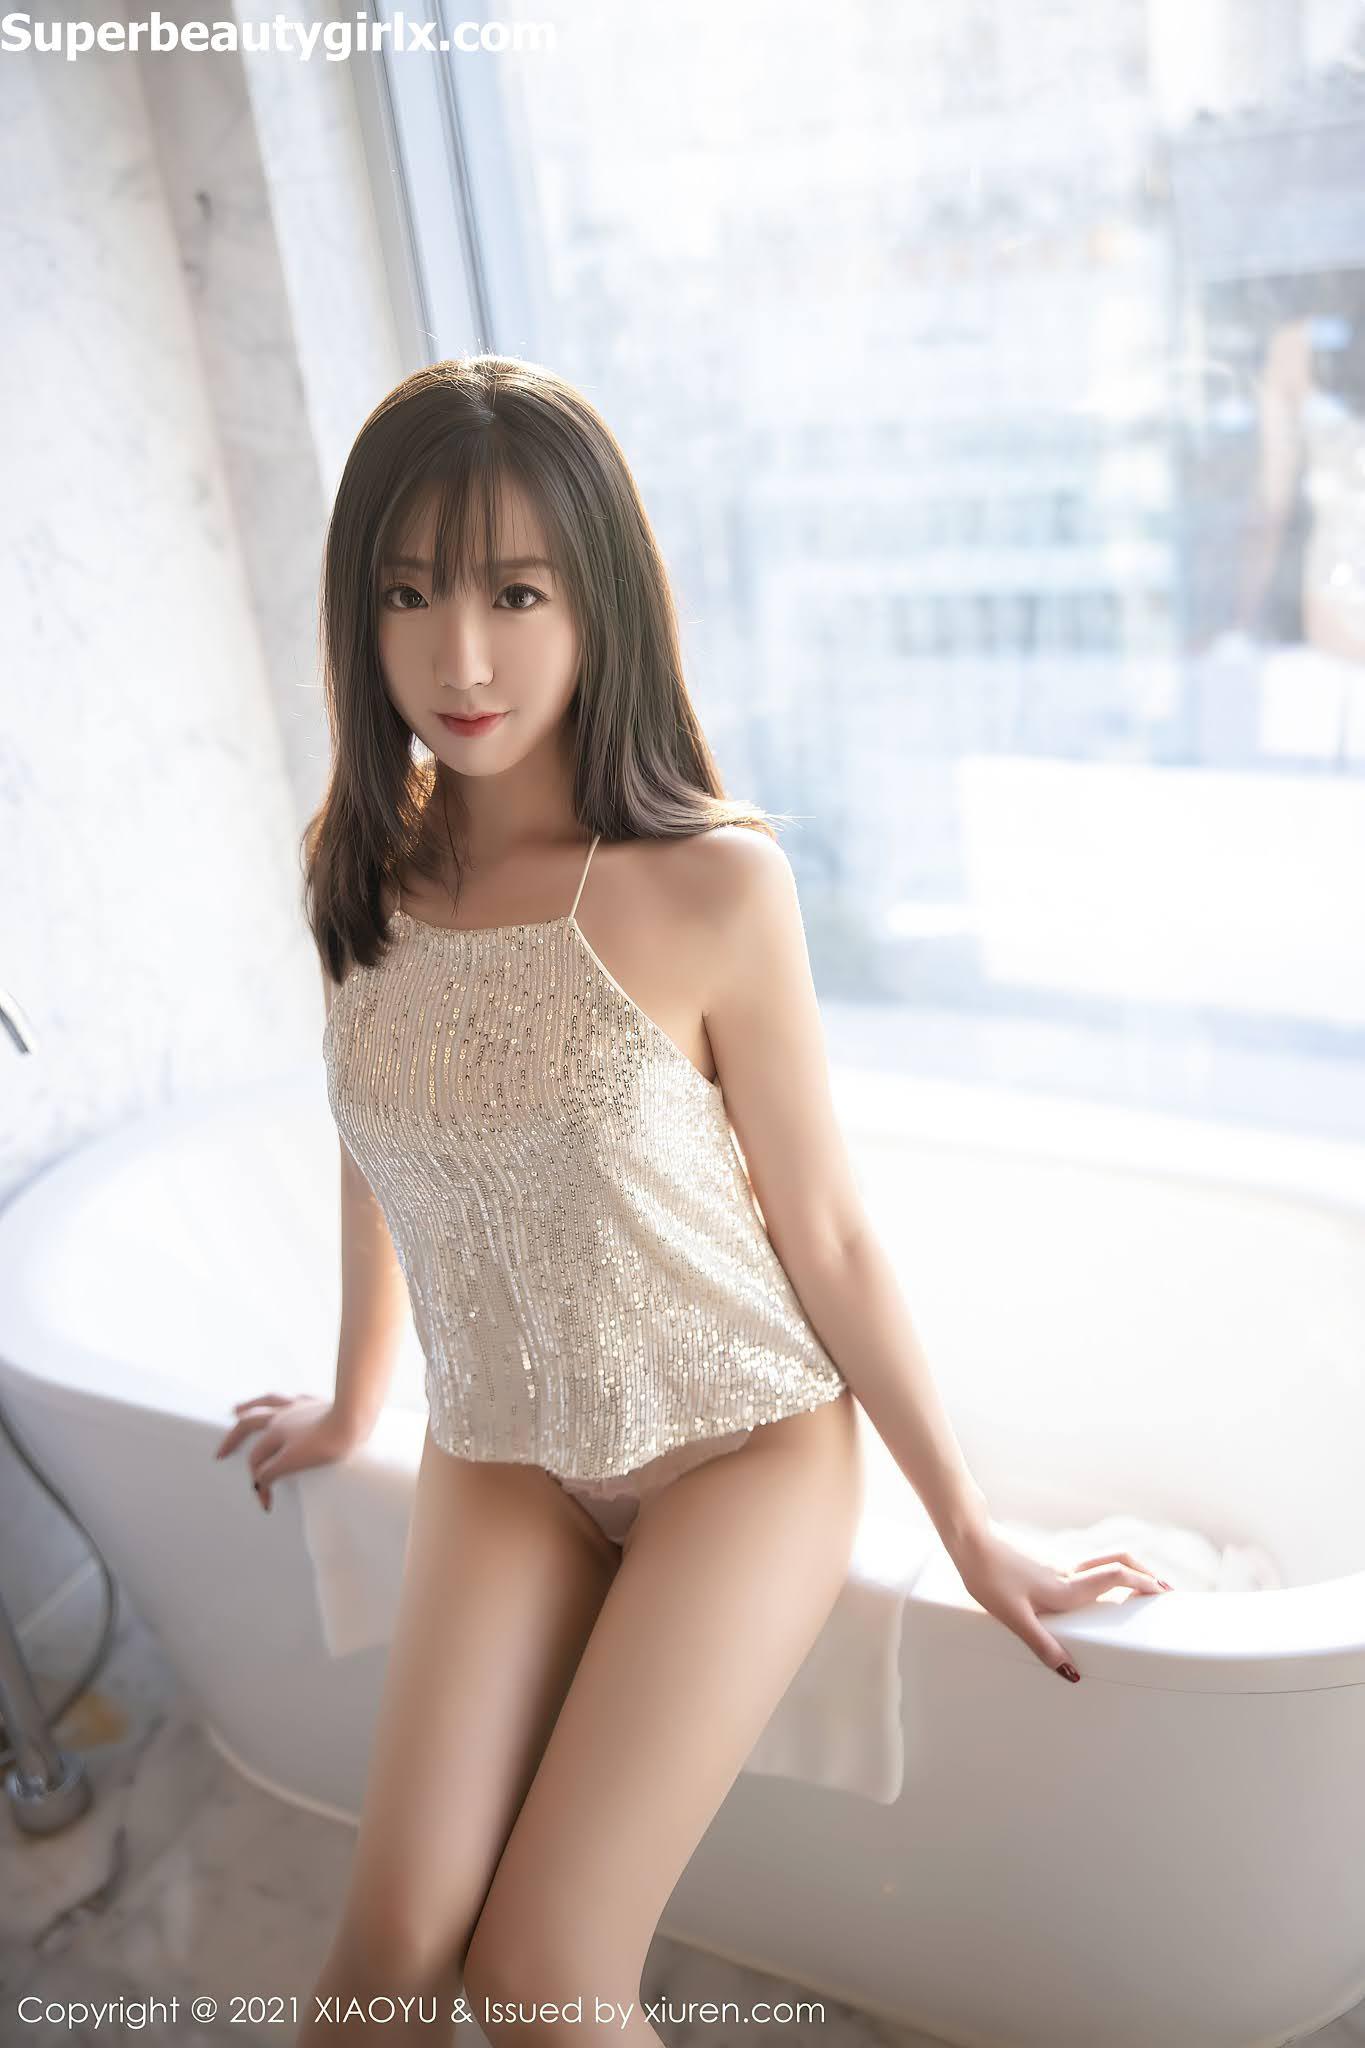 XiaoYu-Vol.479-Superbeautygirlx.com